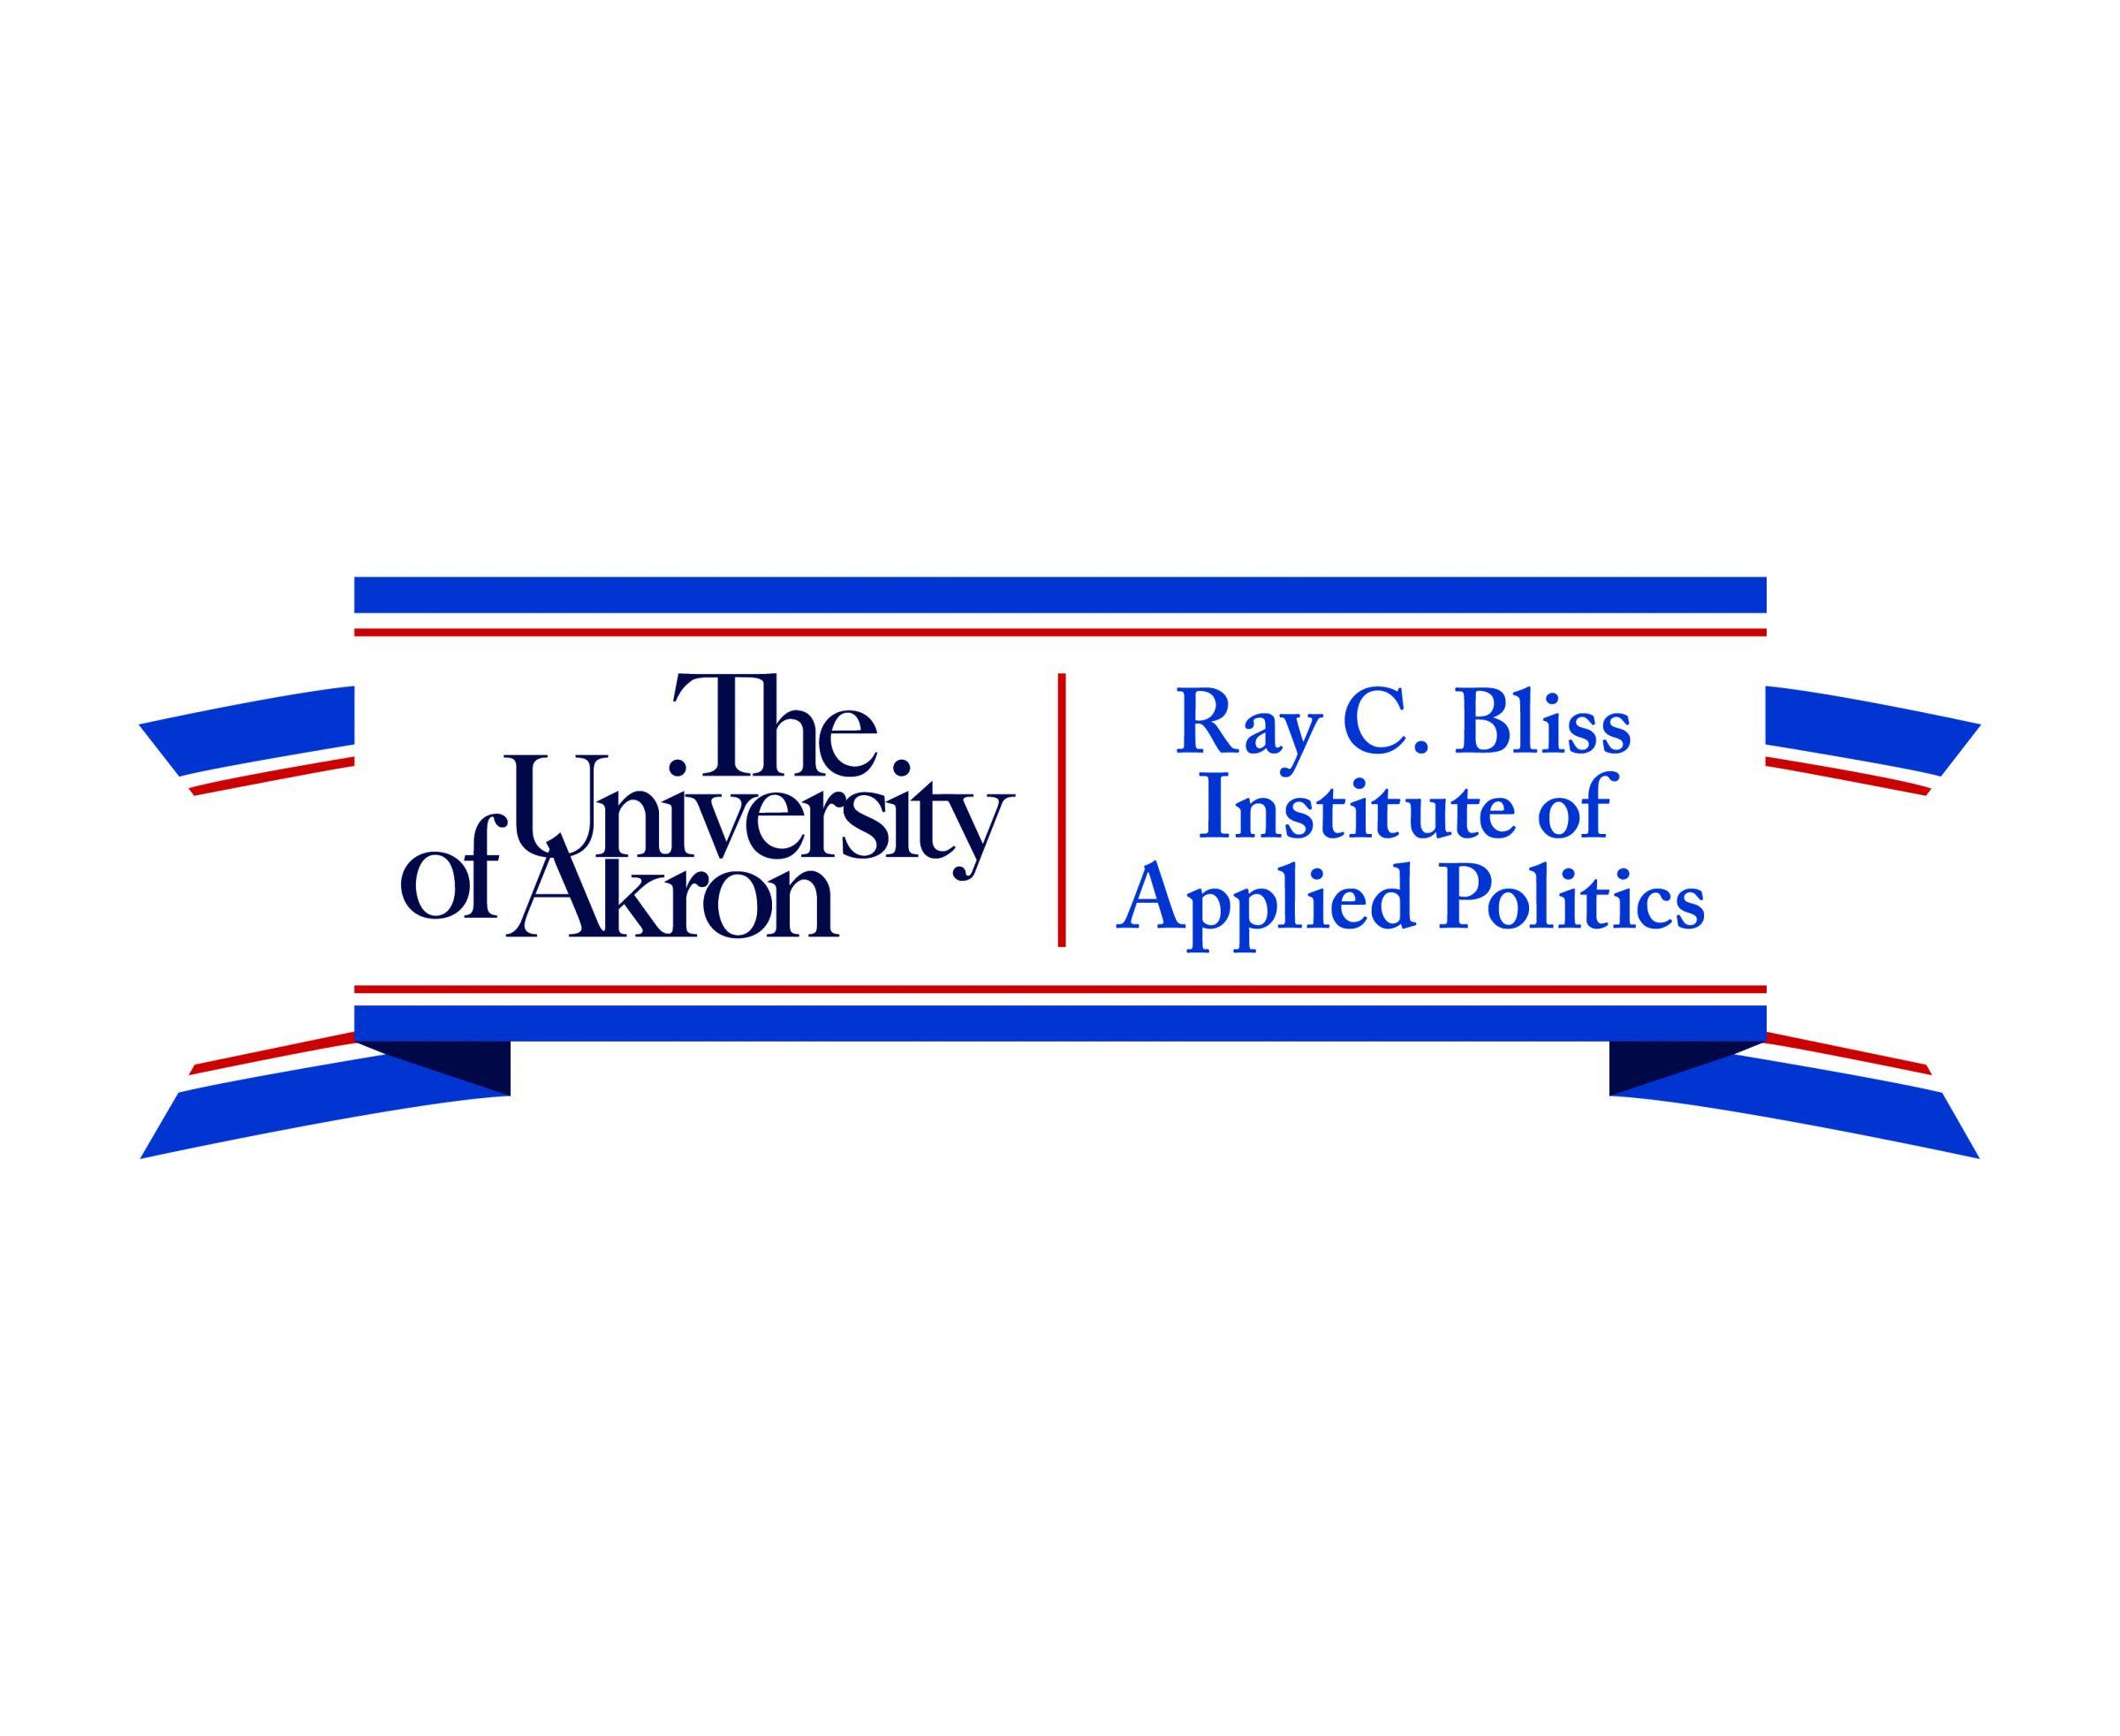 University of Akron Bliss Institute